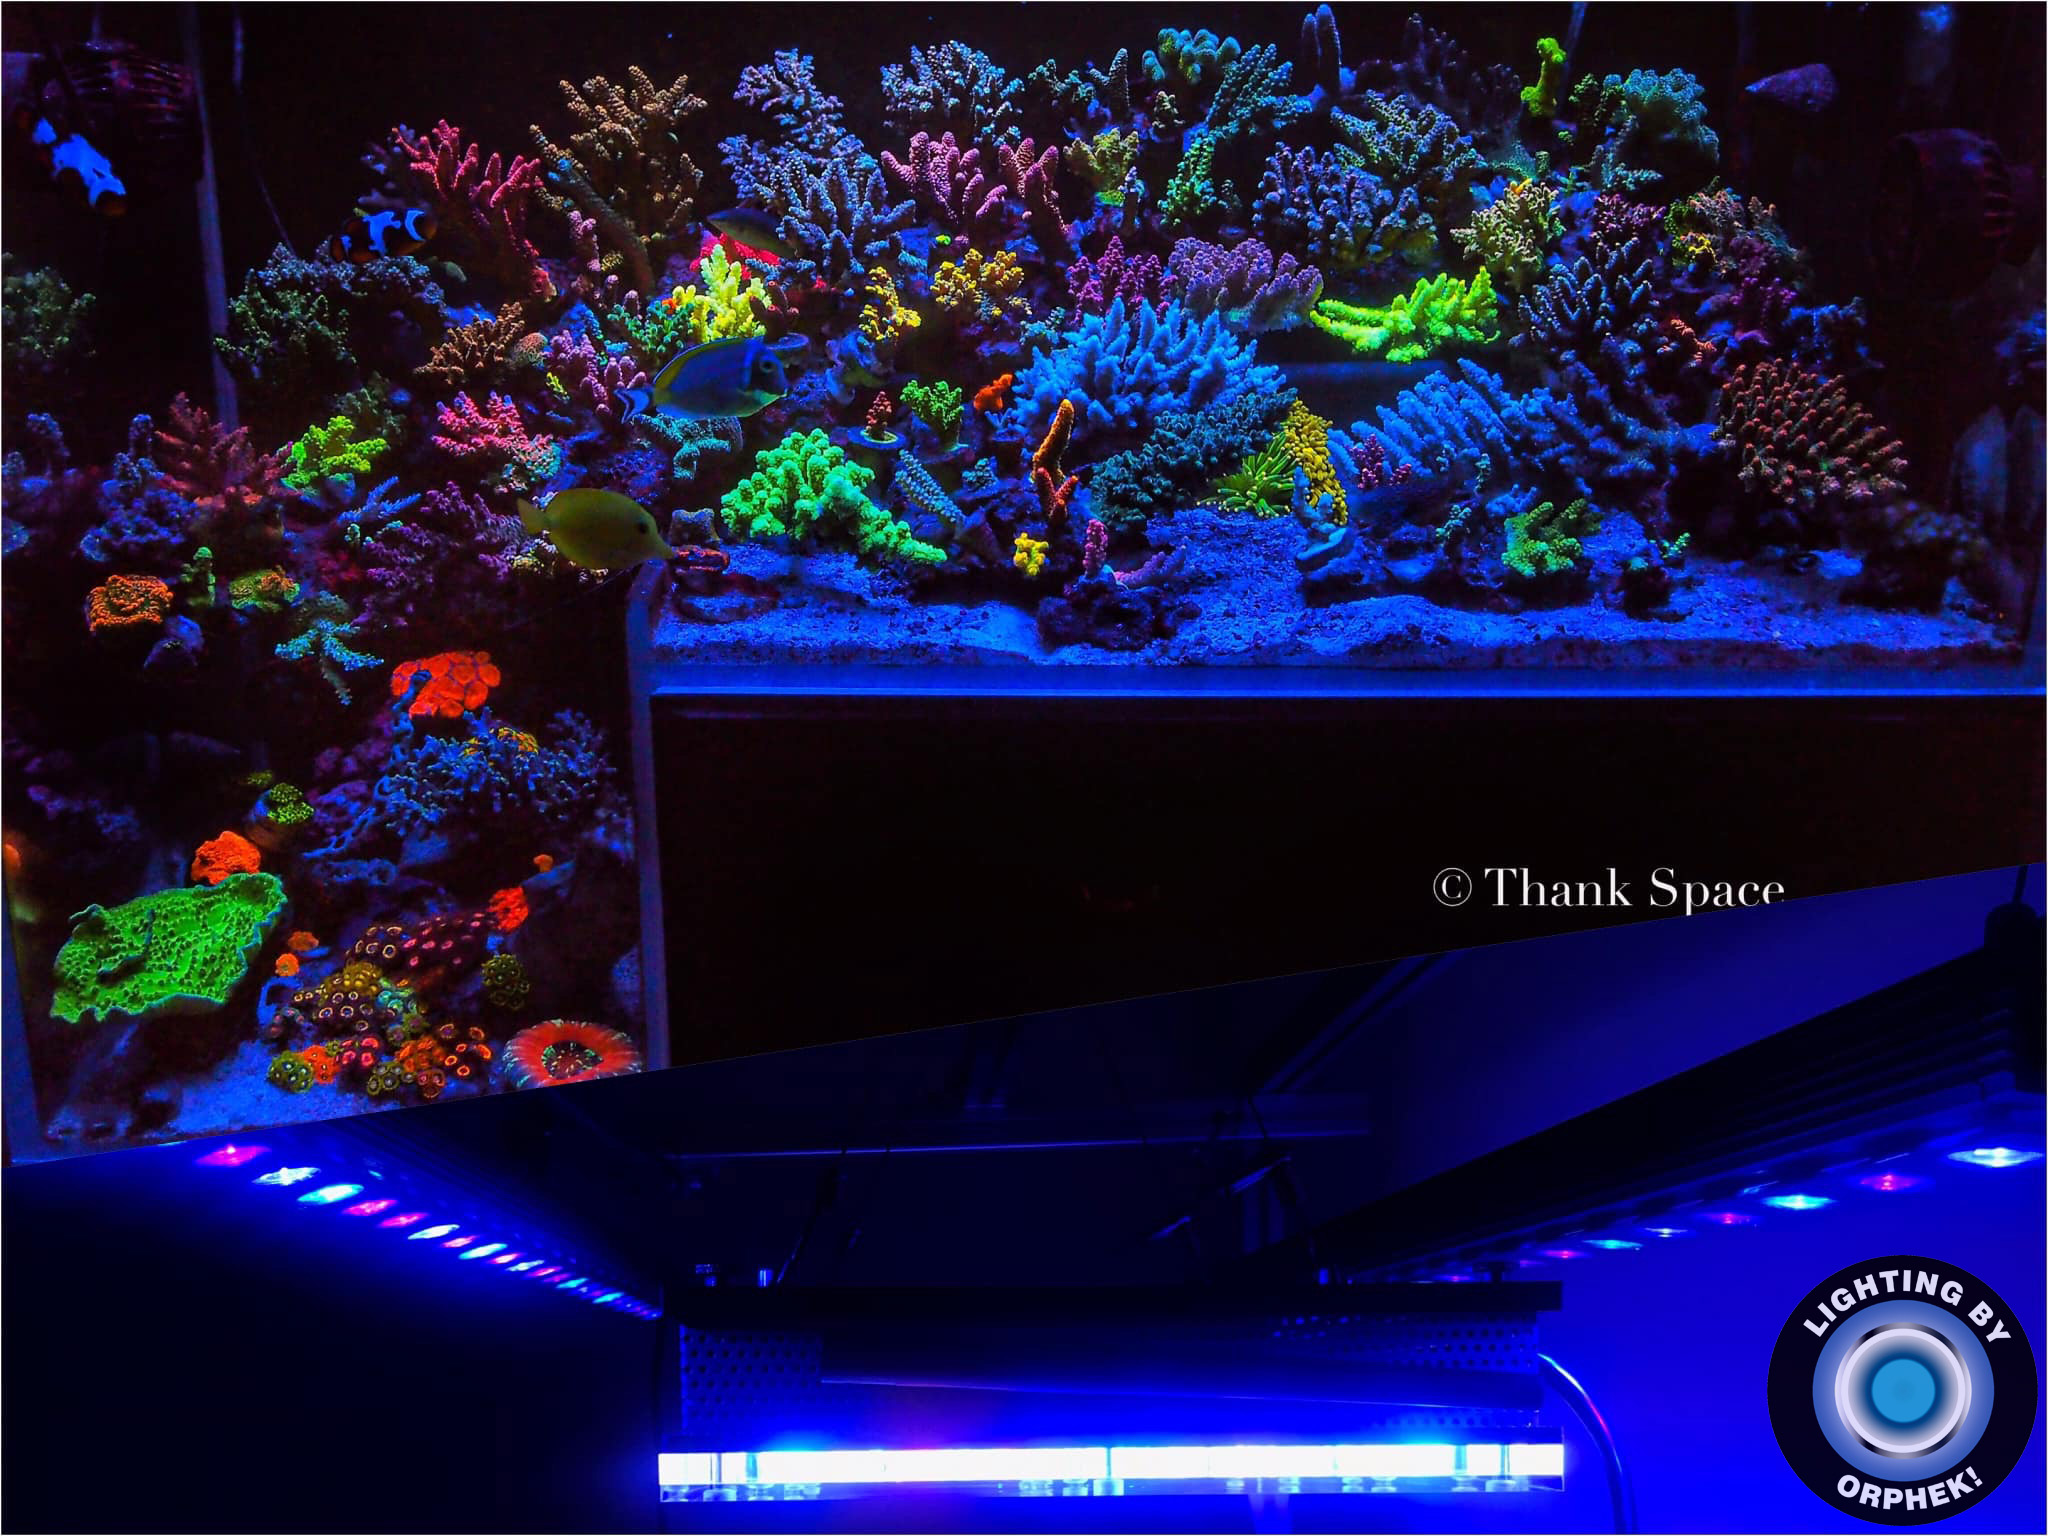 orphek 조명 최고의 산호 팝 리프 LED